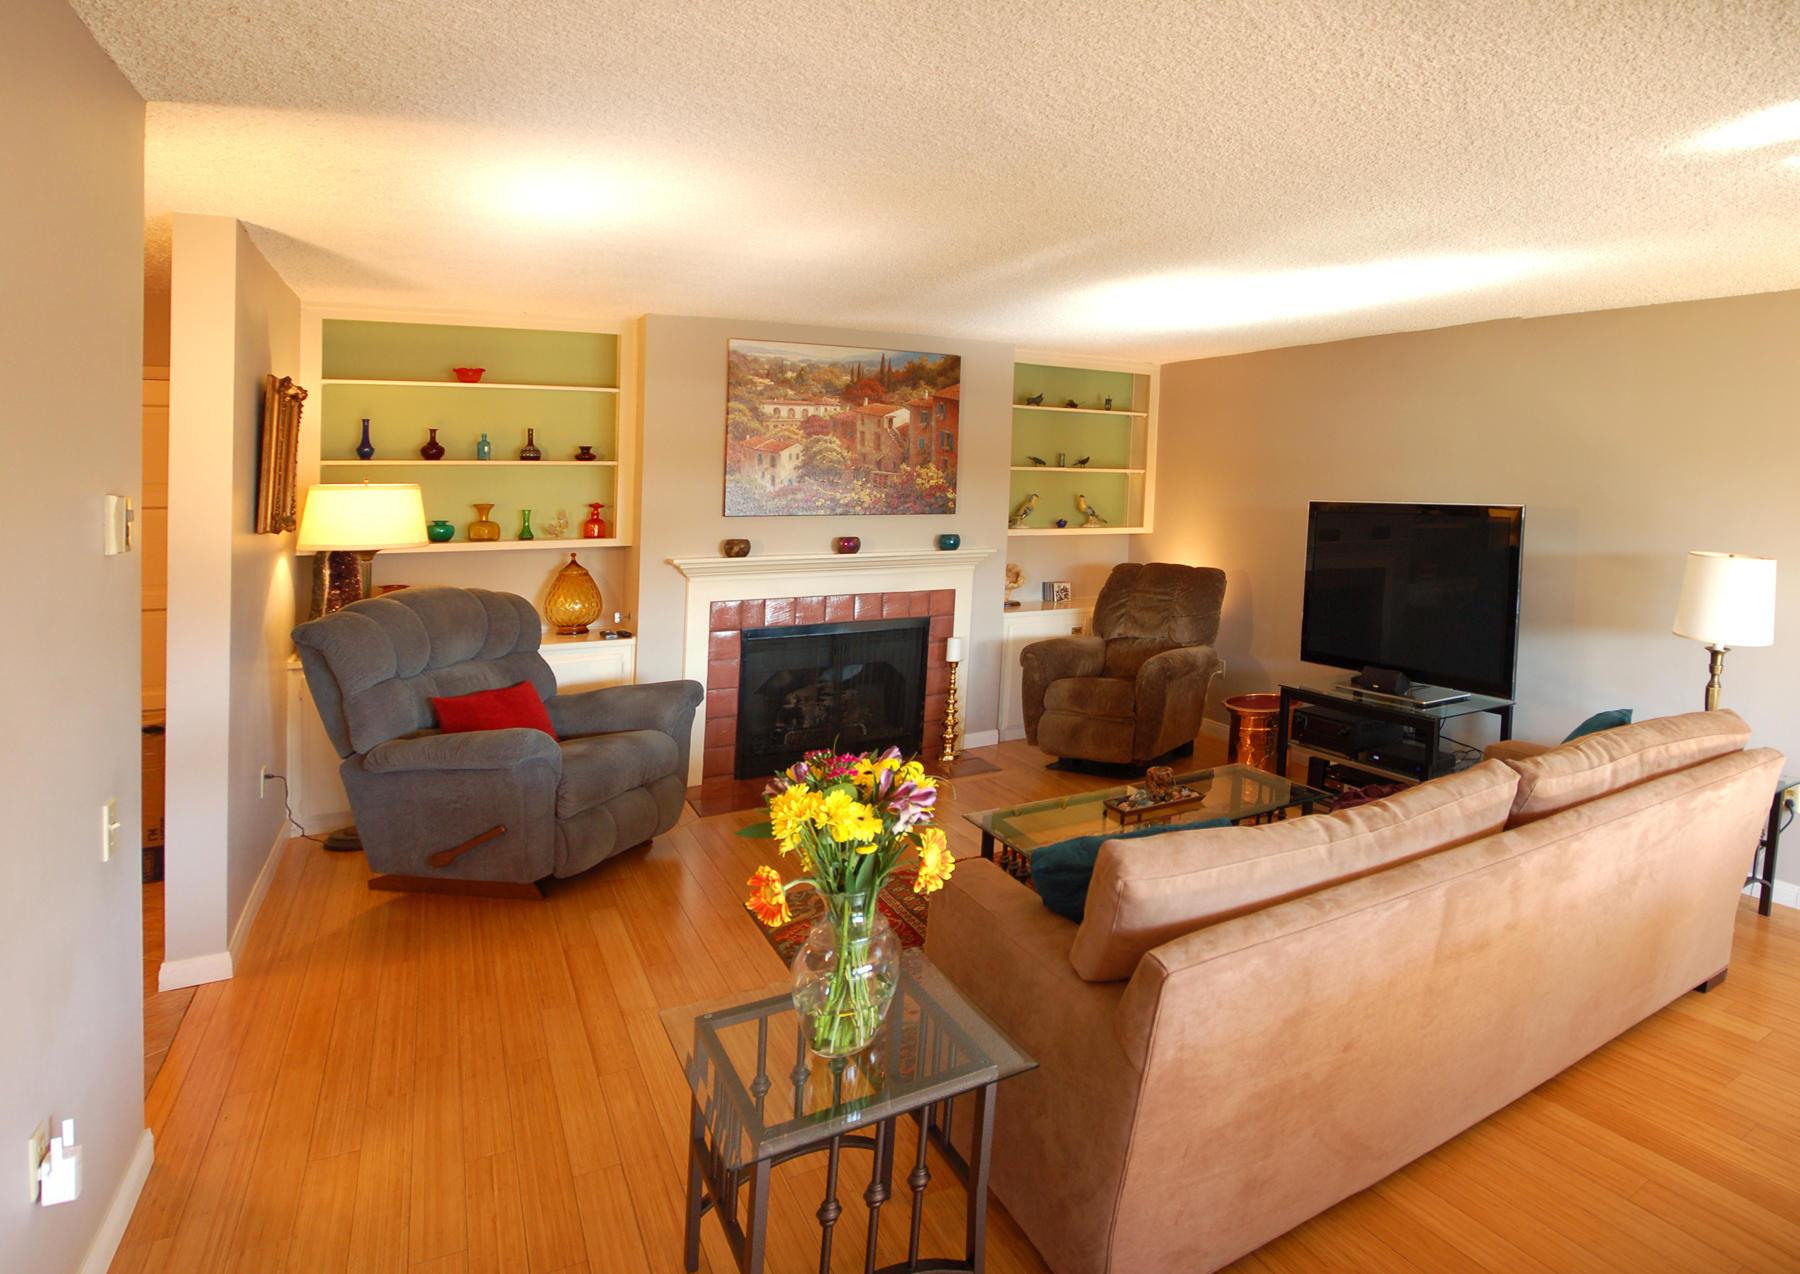 Property photo for 2525 State St #6 Santa Barbara, California 93105 - 18-383